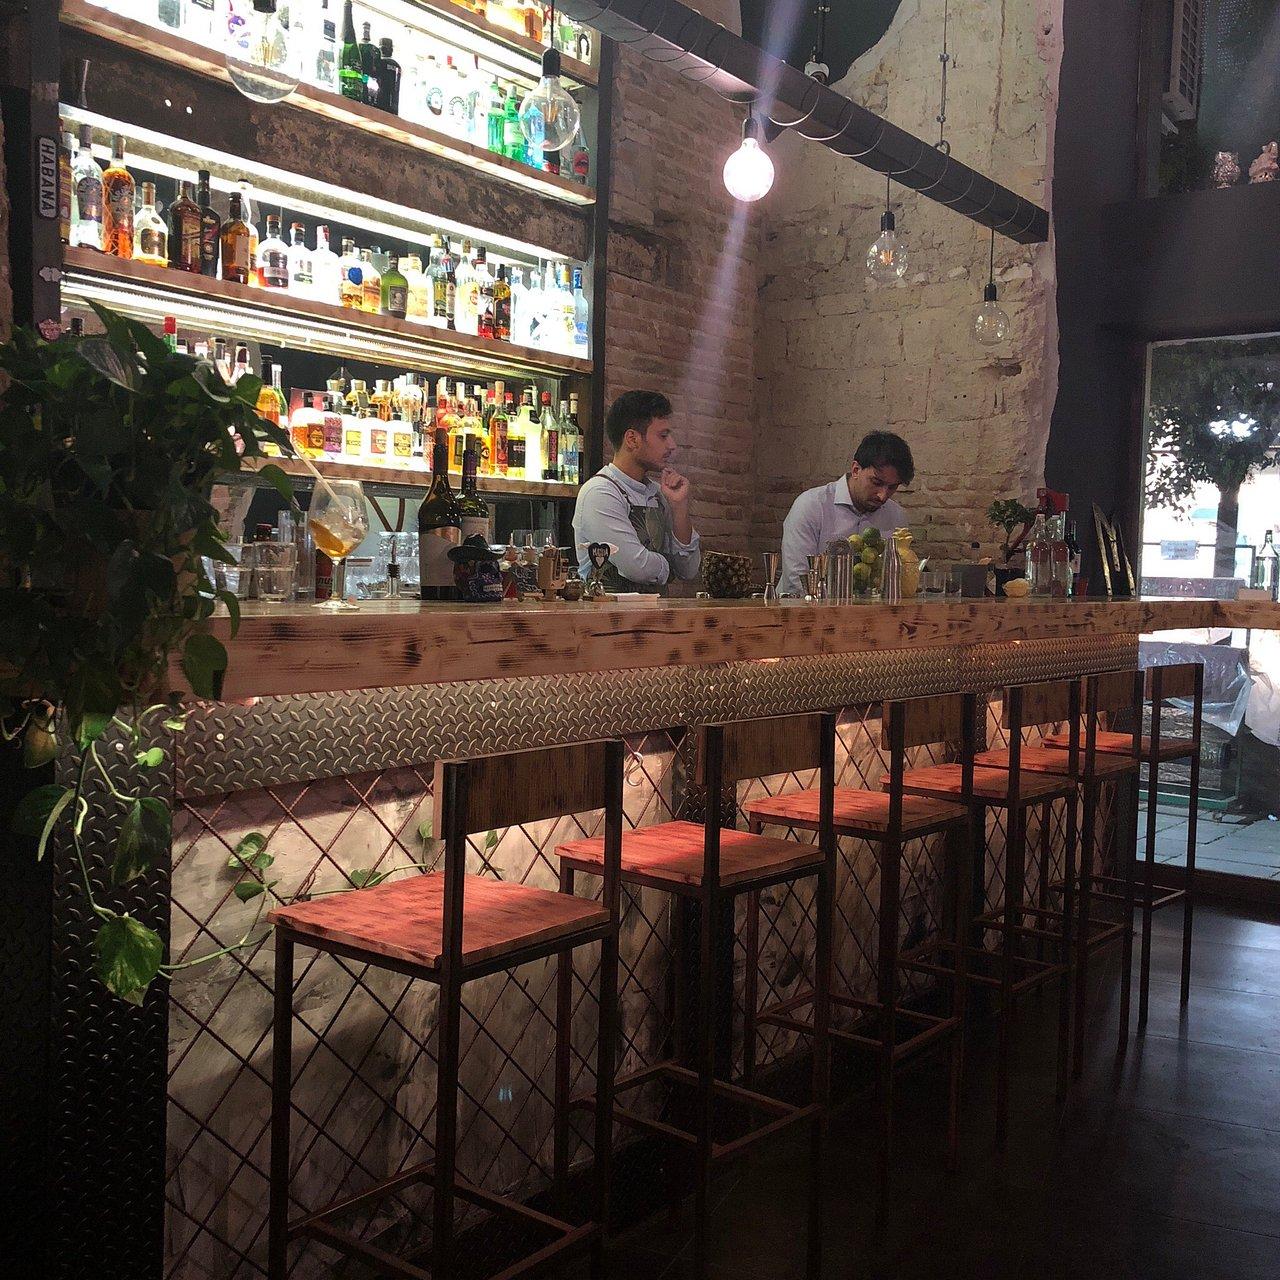 Misture Cocktail Bar, Napoli